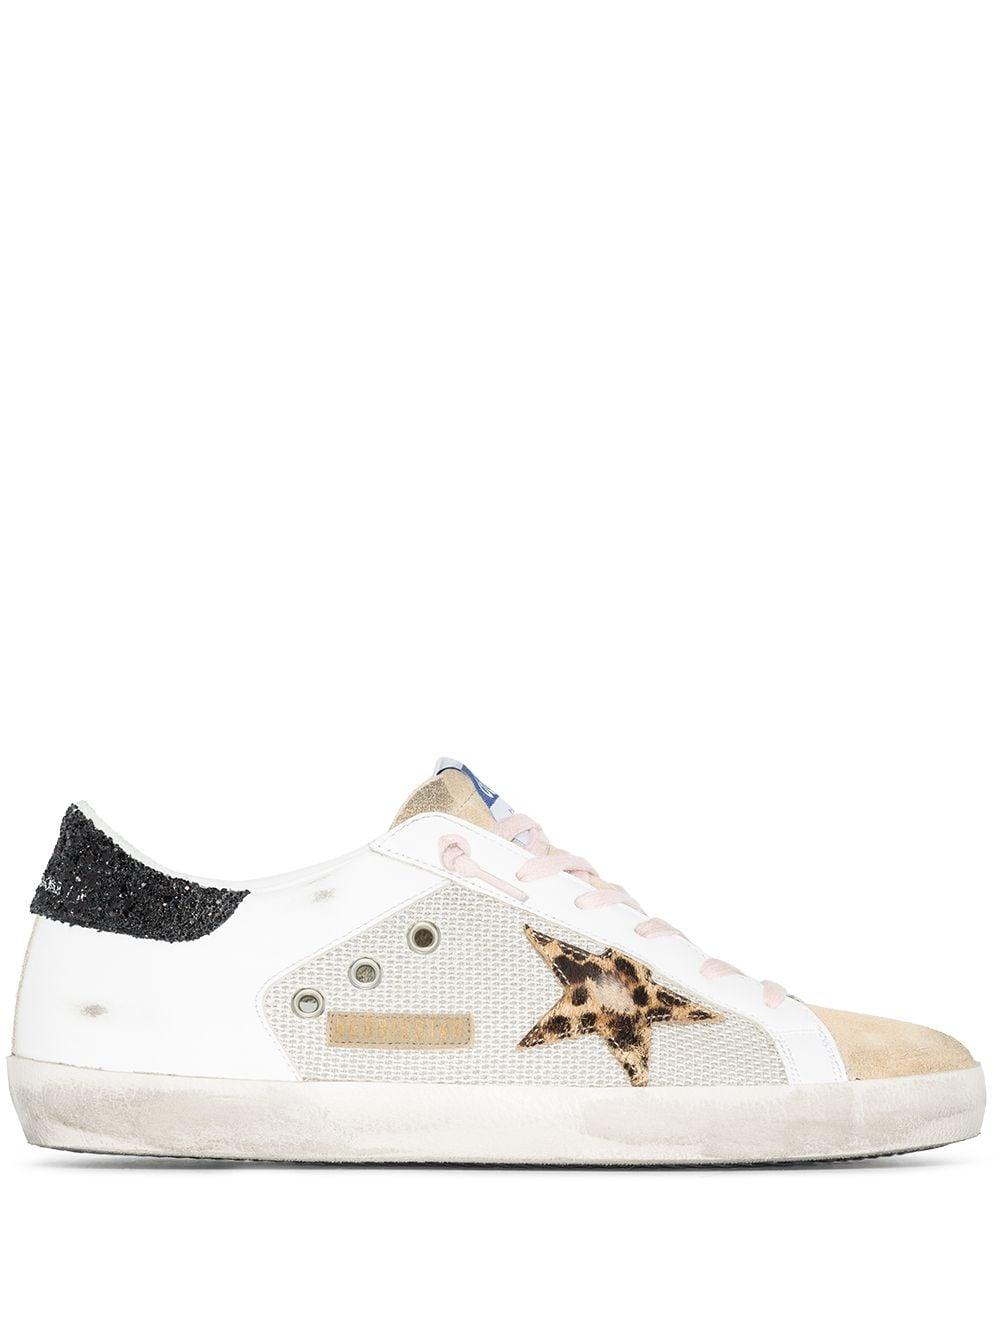 Picture of Golden Goose Deluxe Brand   Super-Star Low Top Sneakers